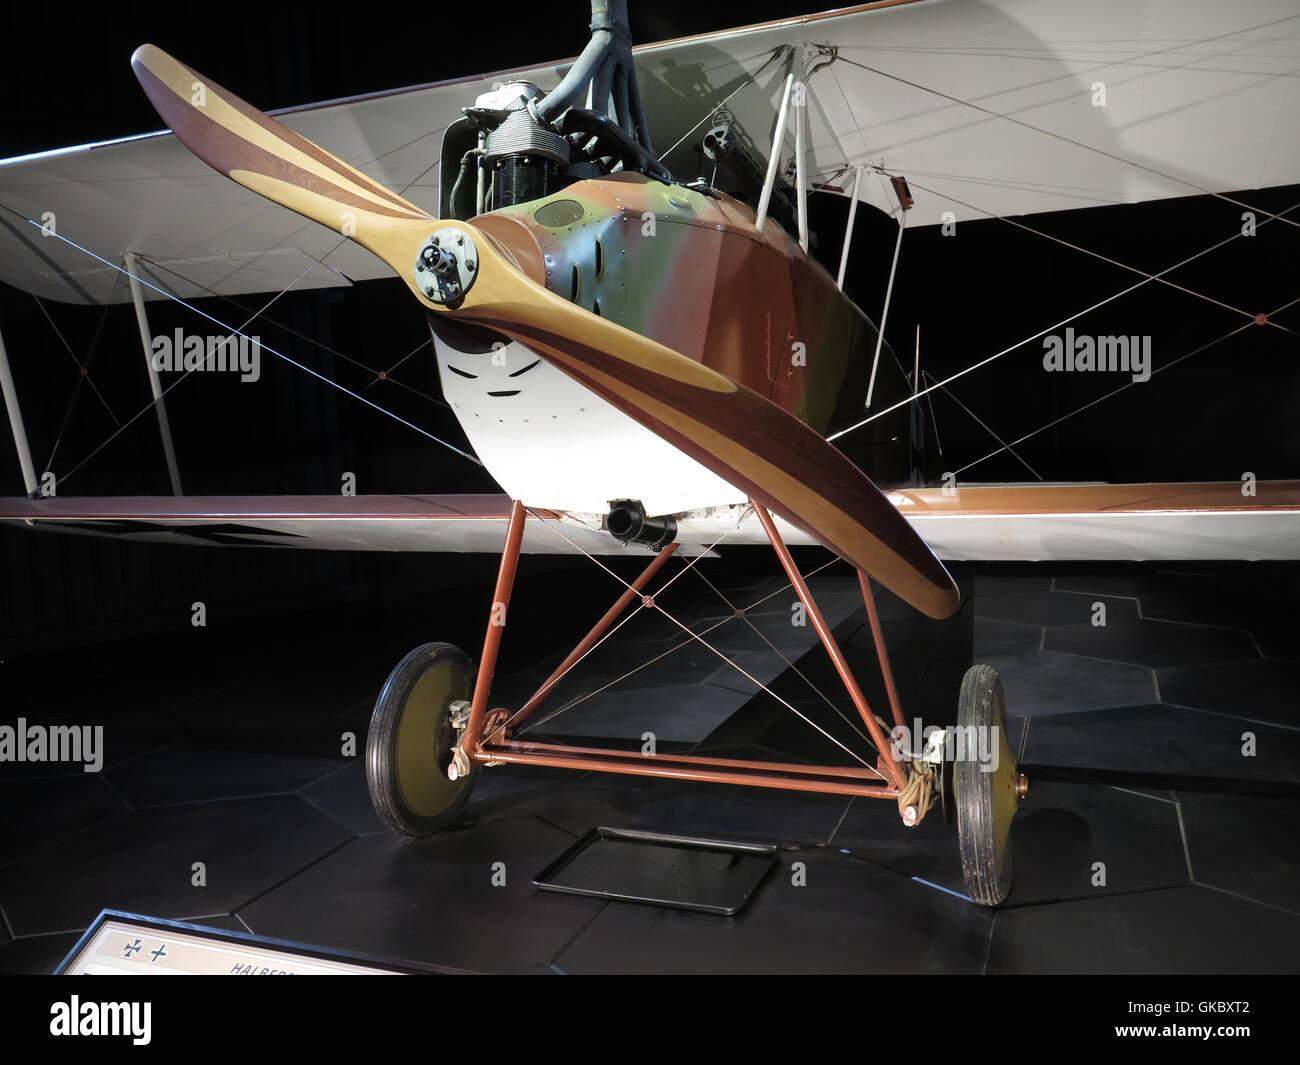 Omaka Aviation Heritage Centre at Blenheim, New Zealand - Stock Image